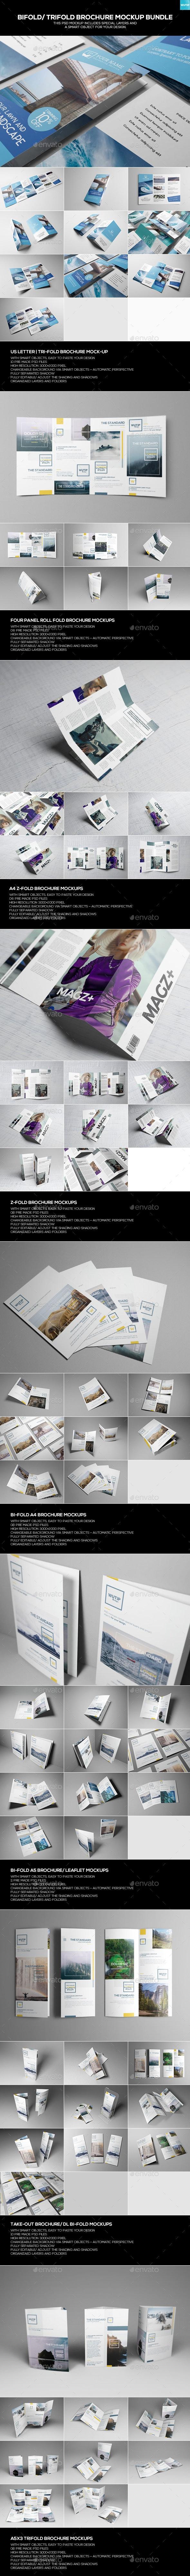 Bifold/ Trifold Brochure Mockup Bundle - Miscellaneous Print